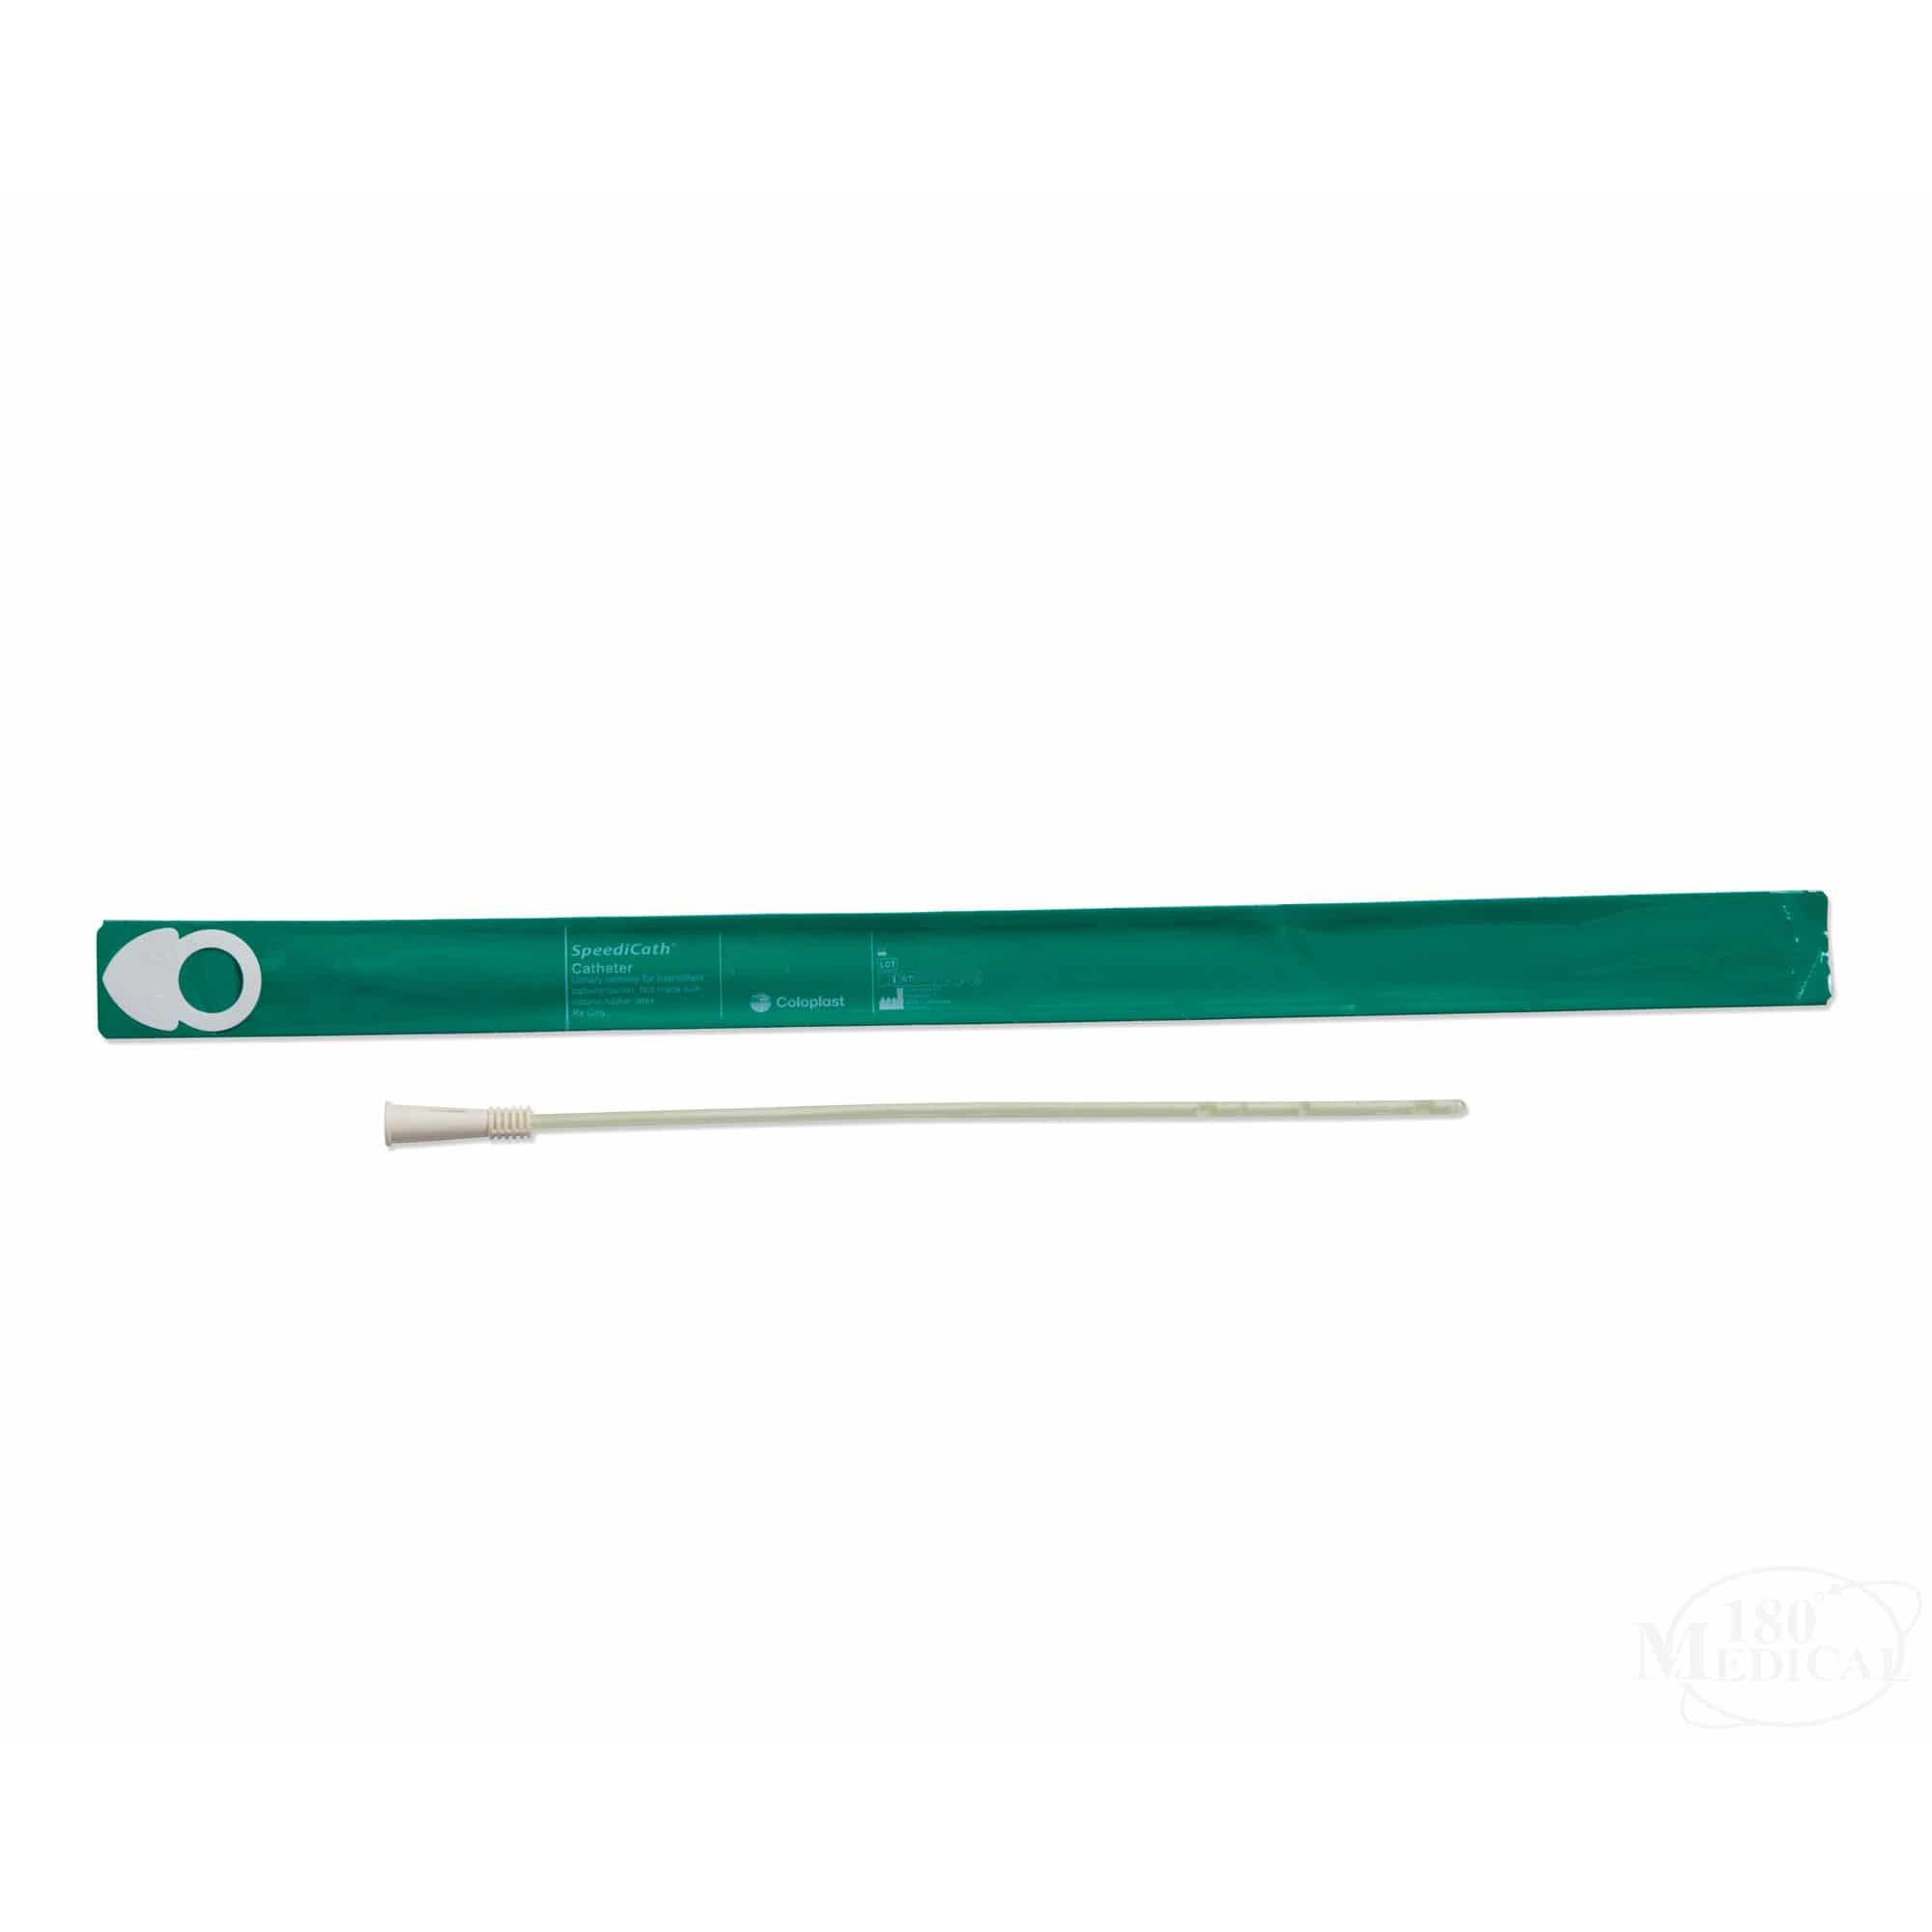 "Coloplast SpeediCath Pediatric Catheter,Straight,Hydrophilic Coating,Sterile, PVC 8Fr, 10"" L"